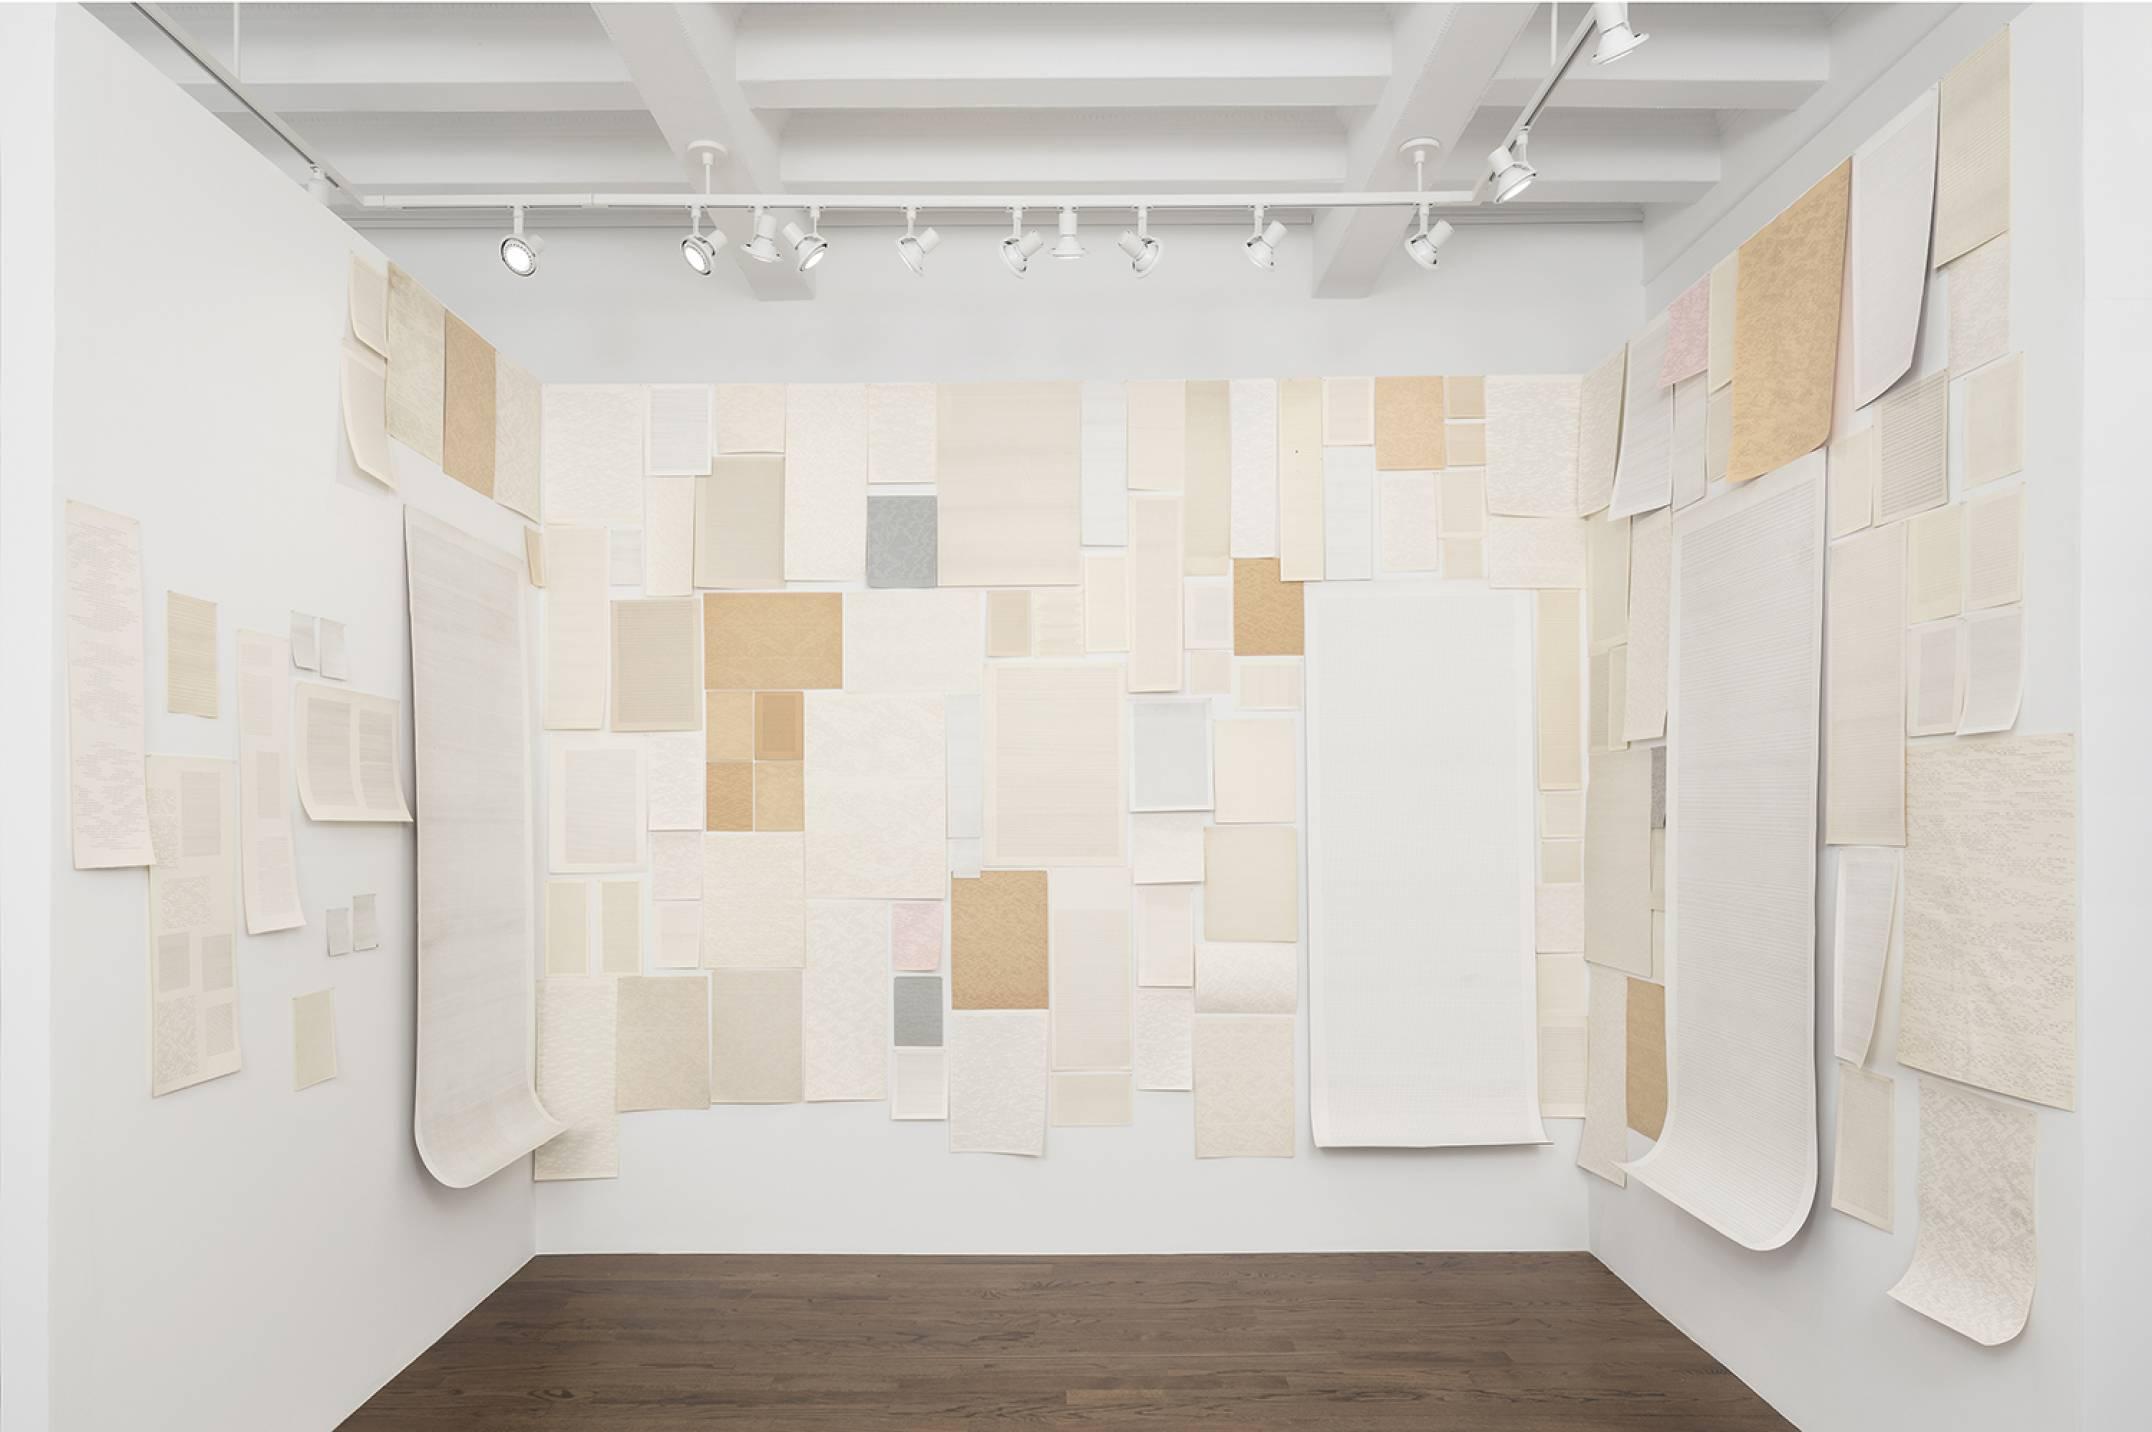 Dadamaino,&nbsp;<em>Fatti della Vita (The facts of life)</em>, 1977/1981, pen on paper, dimensions variable - Mendes Wood DM